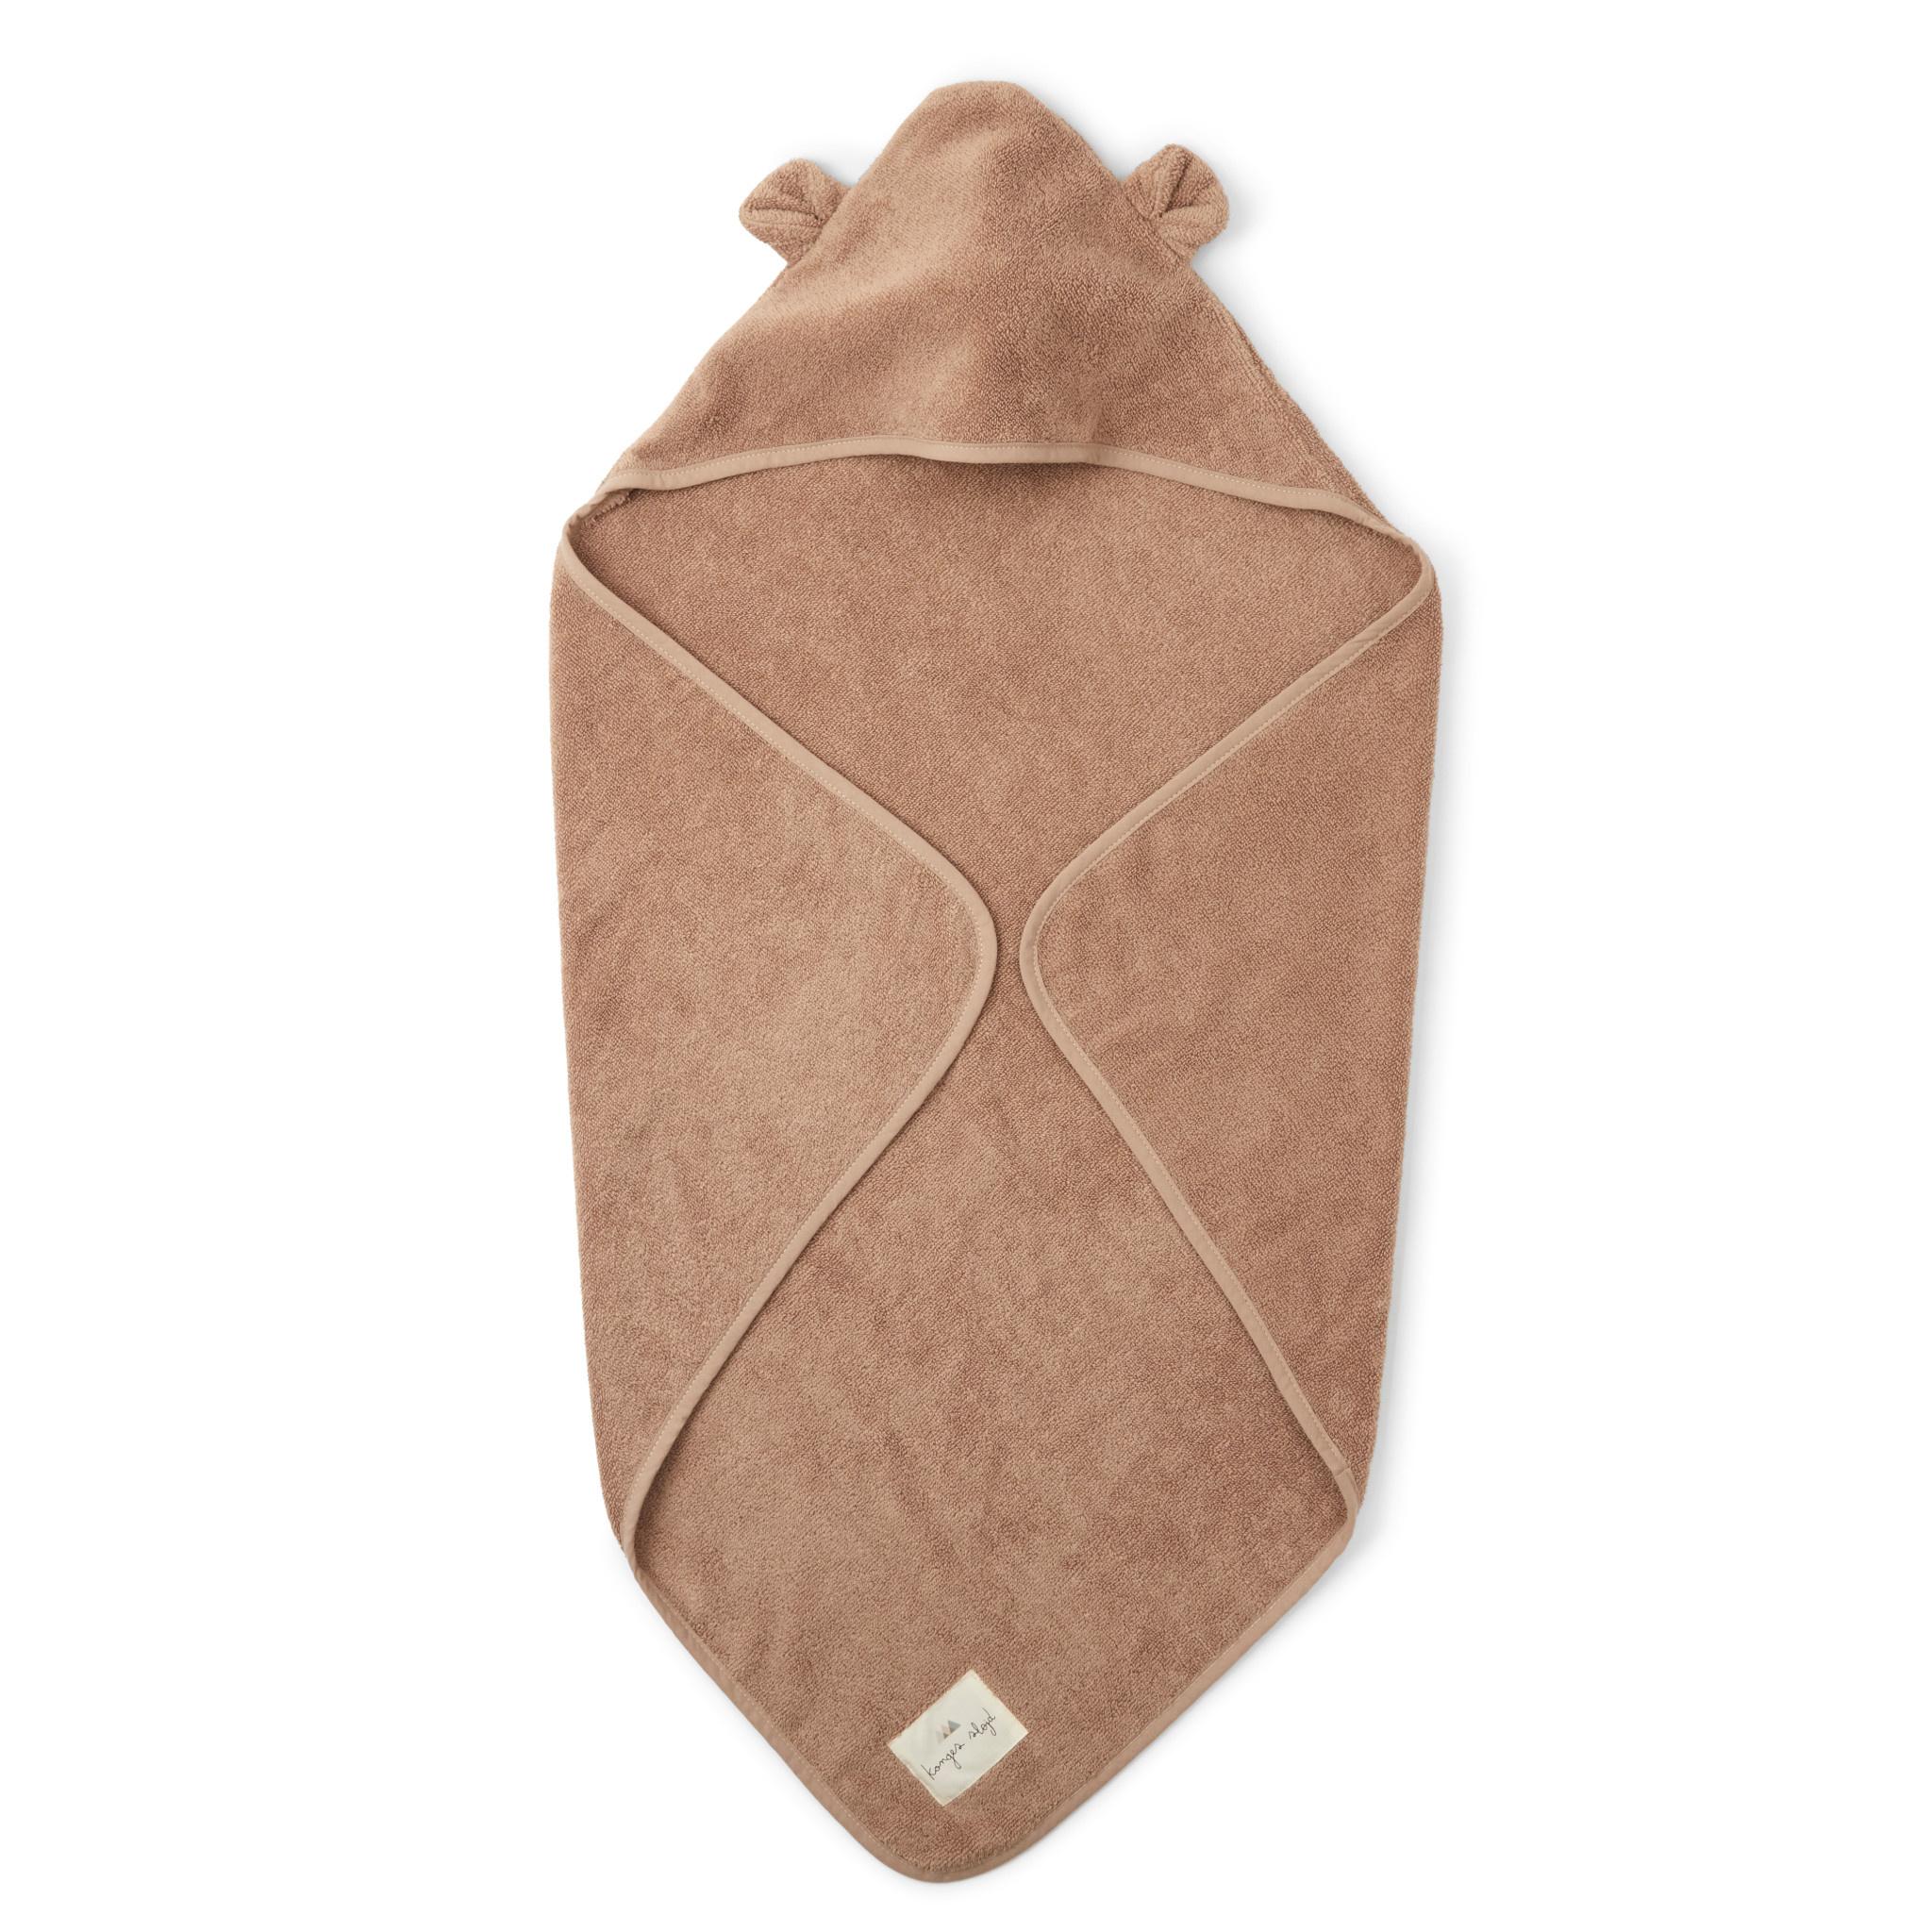 Terry towel beige tan-1